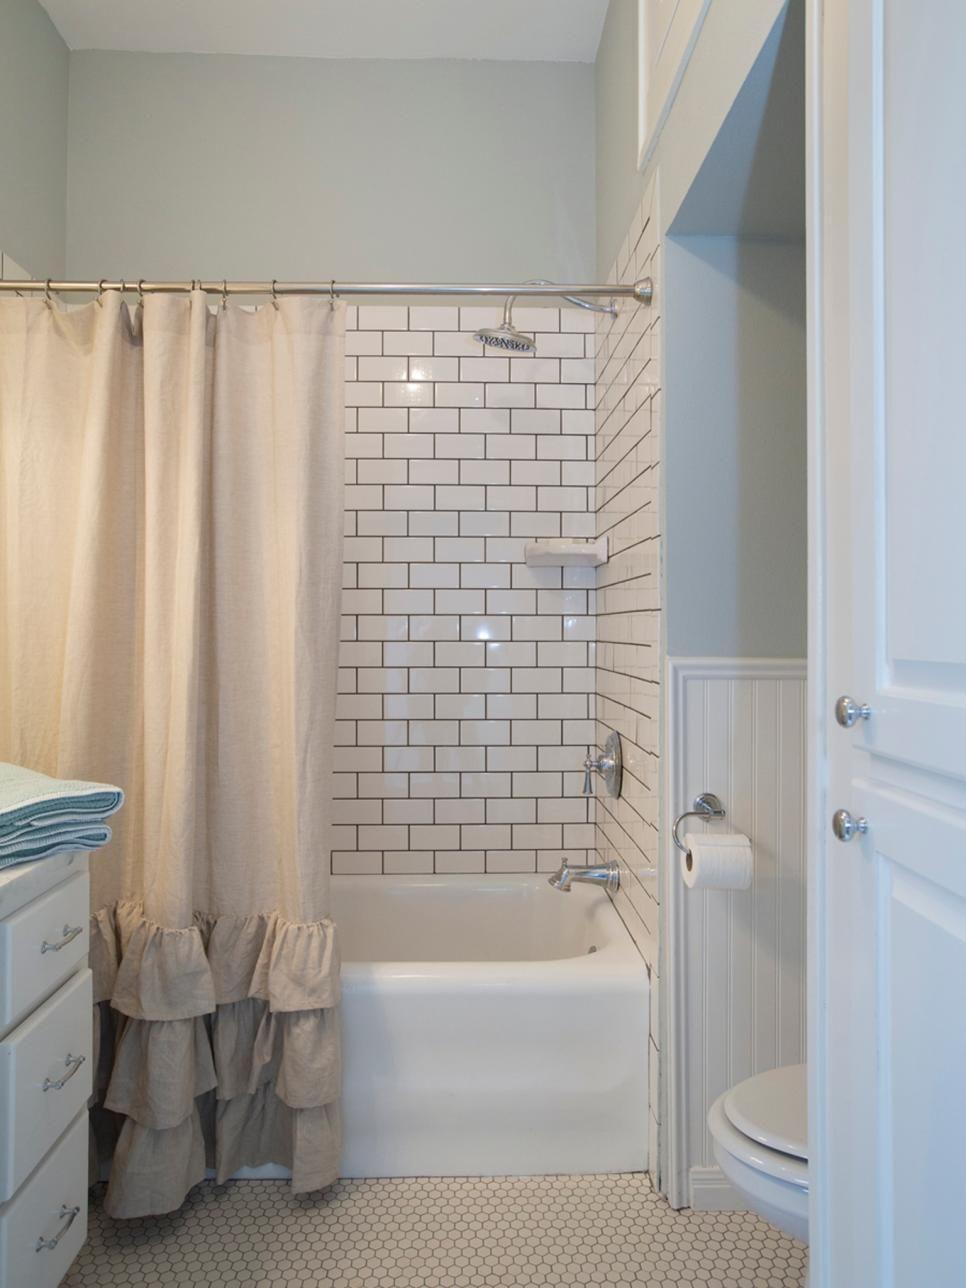 Badezimmer ideen 2018  coruscating duschvorhang kleine badezimmer foto inspirationen